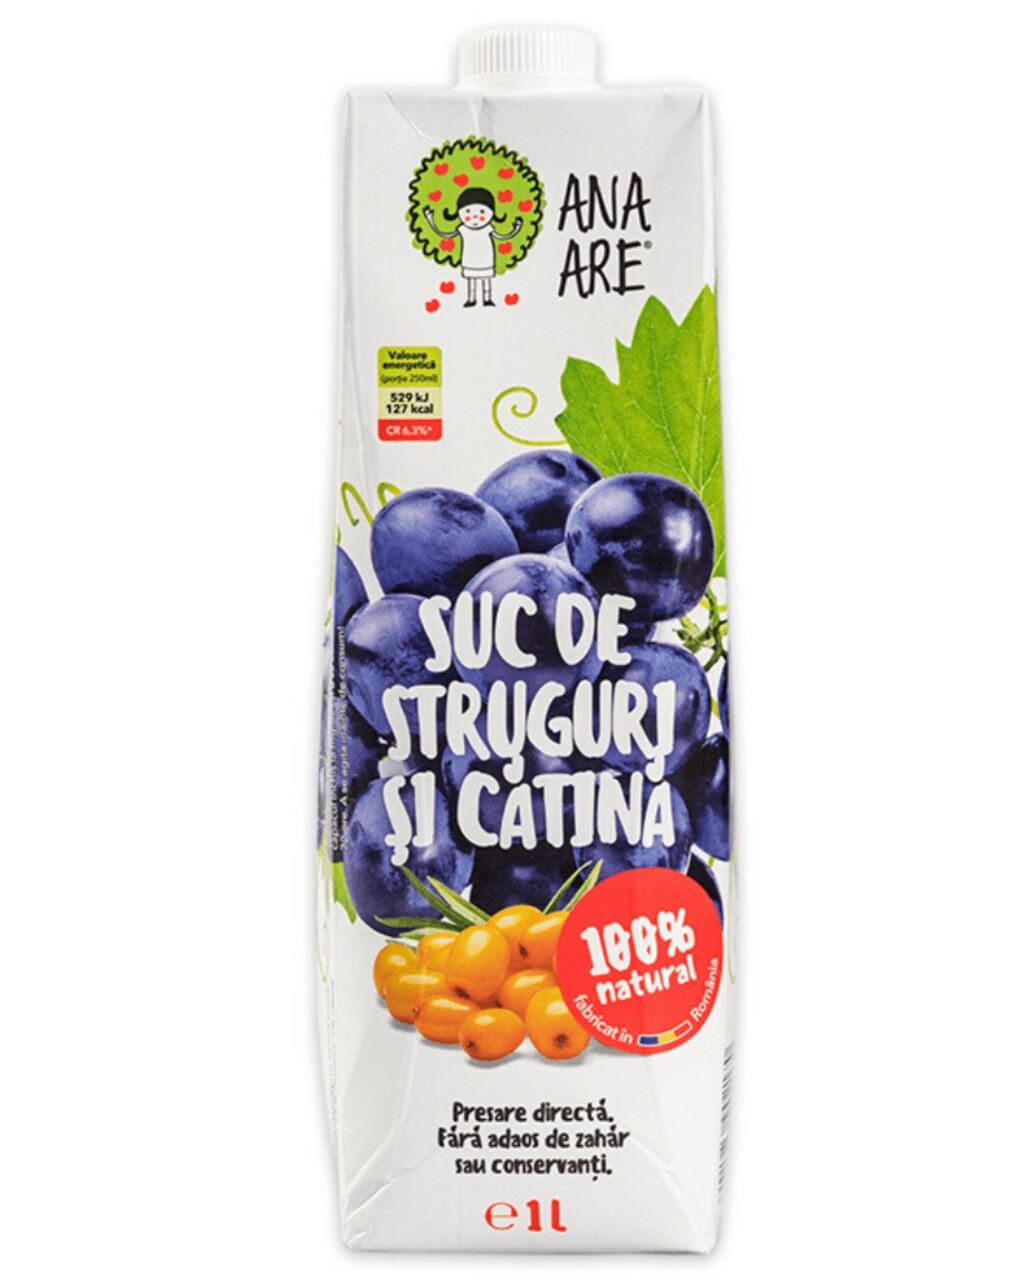 Suc de Struguri & Catina 100% Natural Ana Are  12X 1L